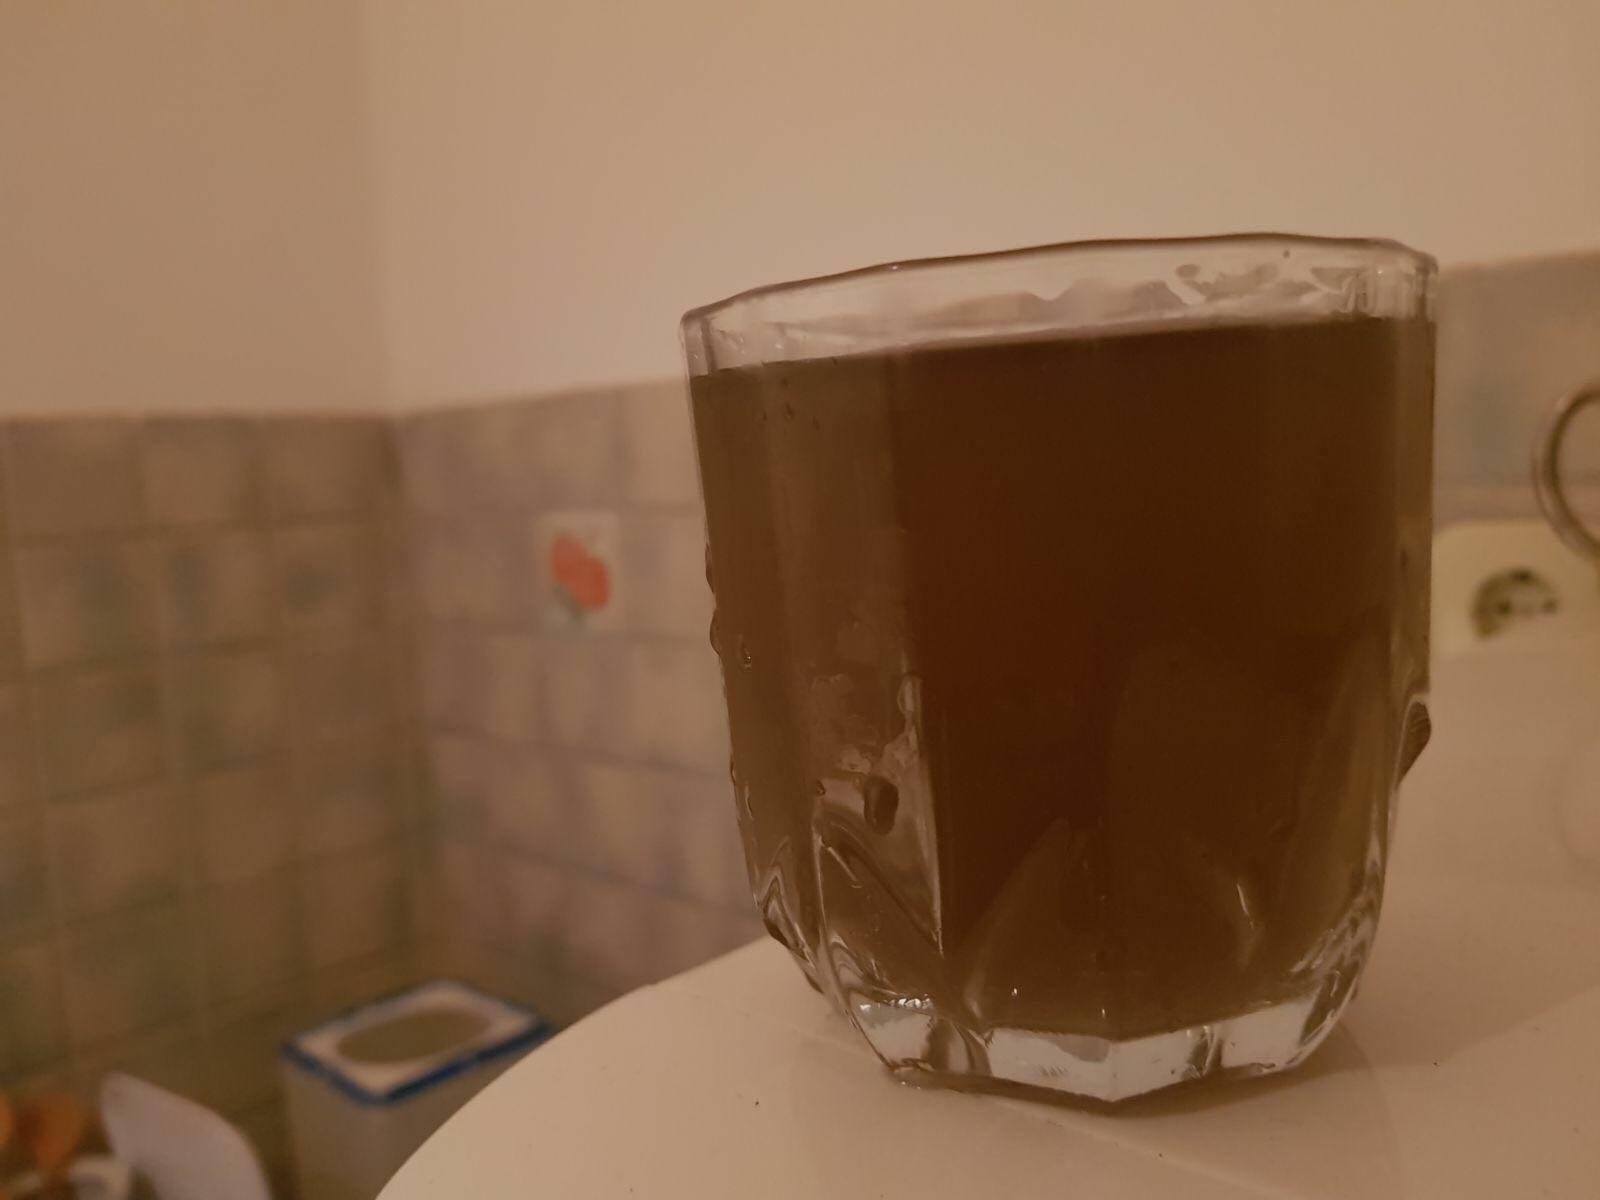 CISTERNE NA TERENU Kiša isprala zemlju, u okolici Splita voda potpuno crna